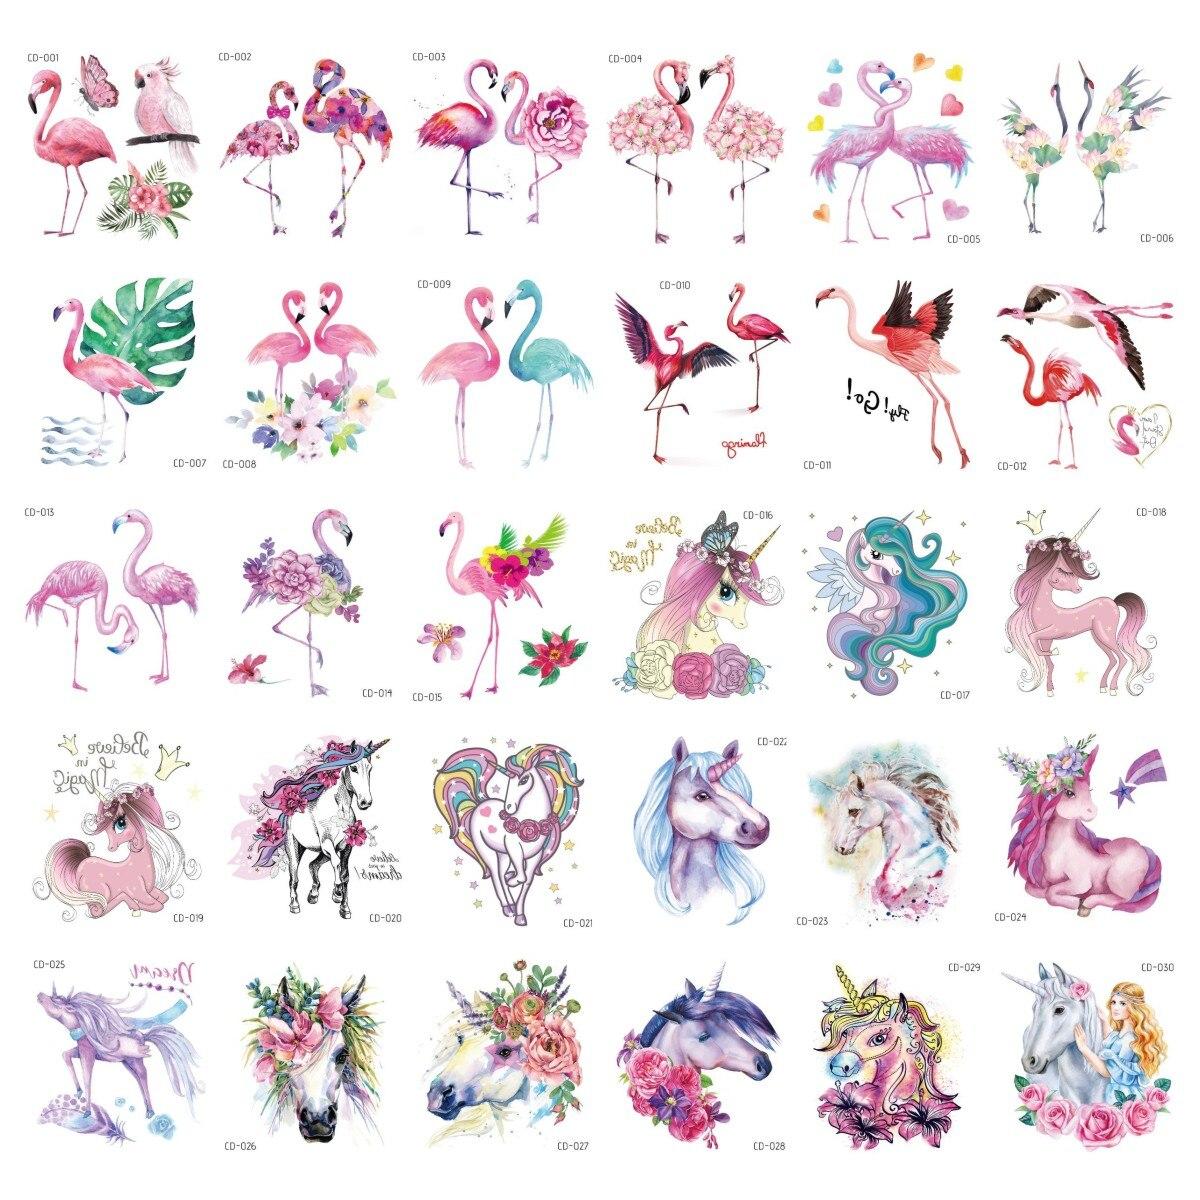 Cartoon Unicorn Flamingo Temporary Tattoo Stickers For Kid Colorful Cute Fake Taty Children Body Art Waterproof Tattoos Sticker